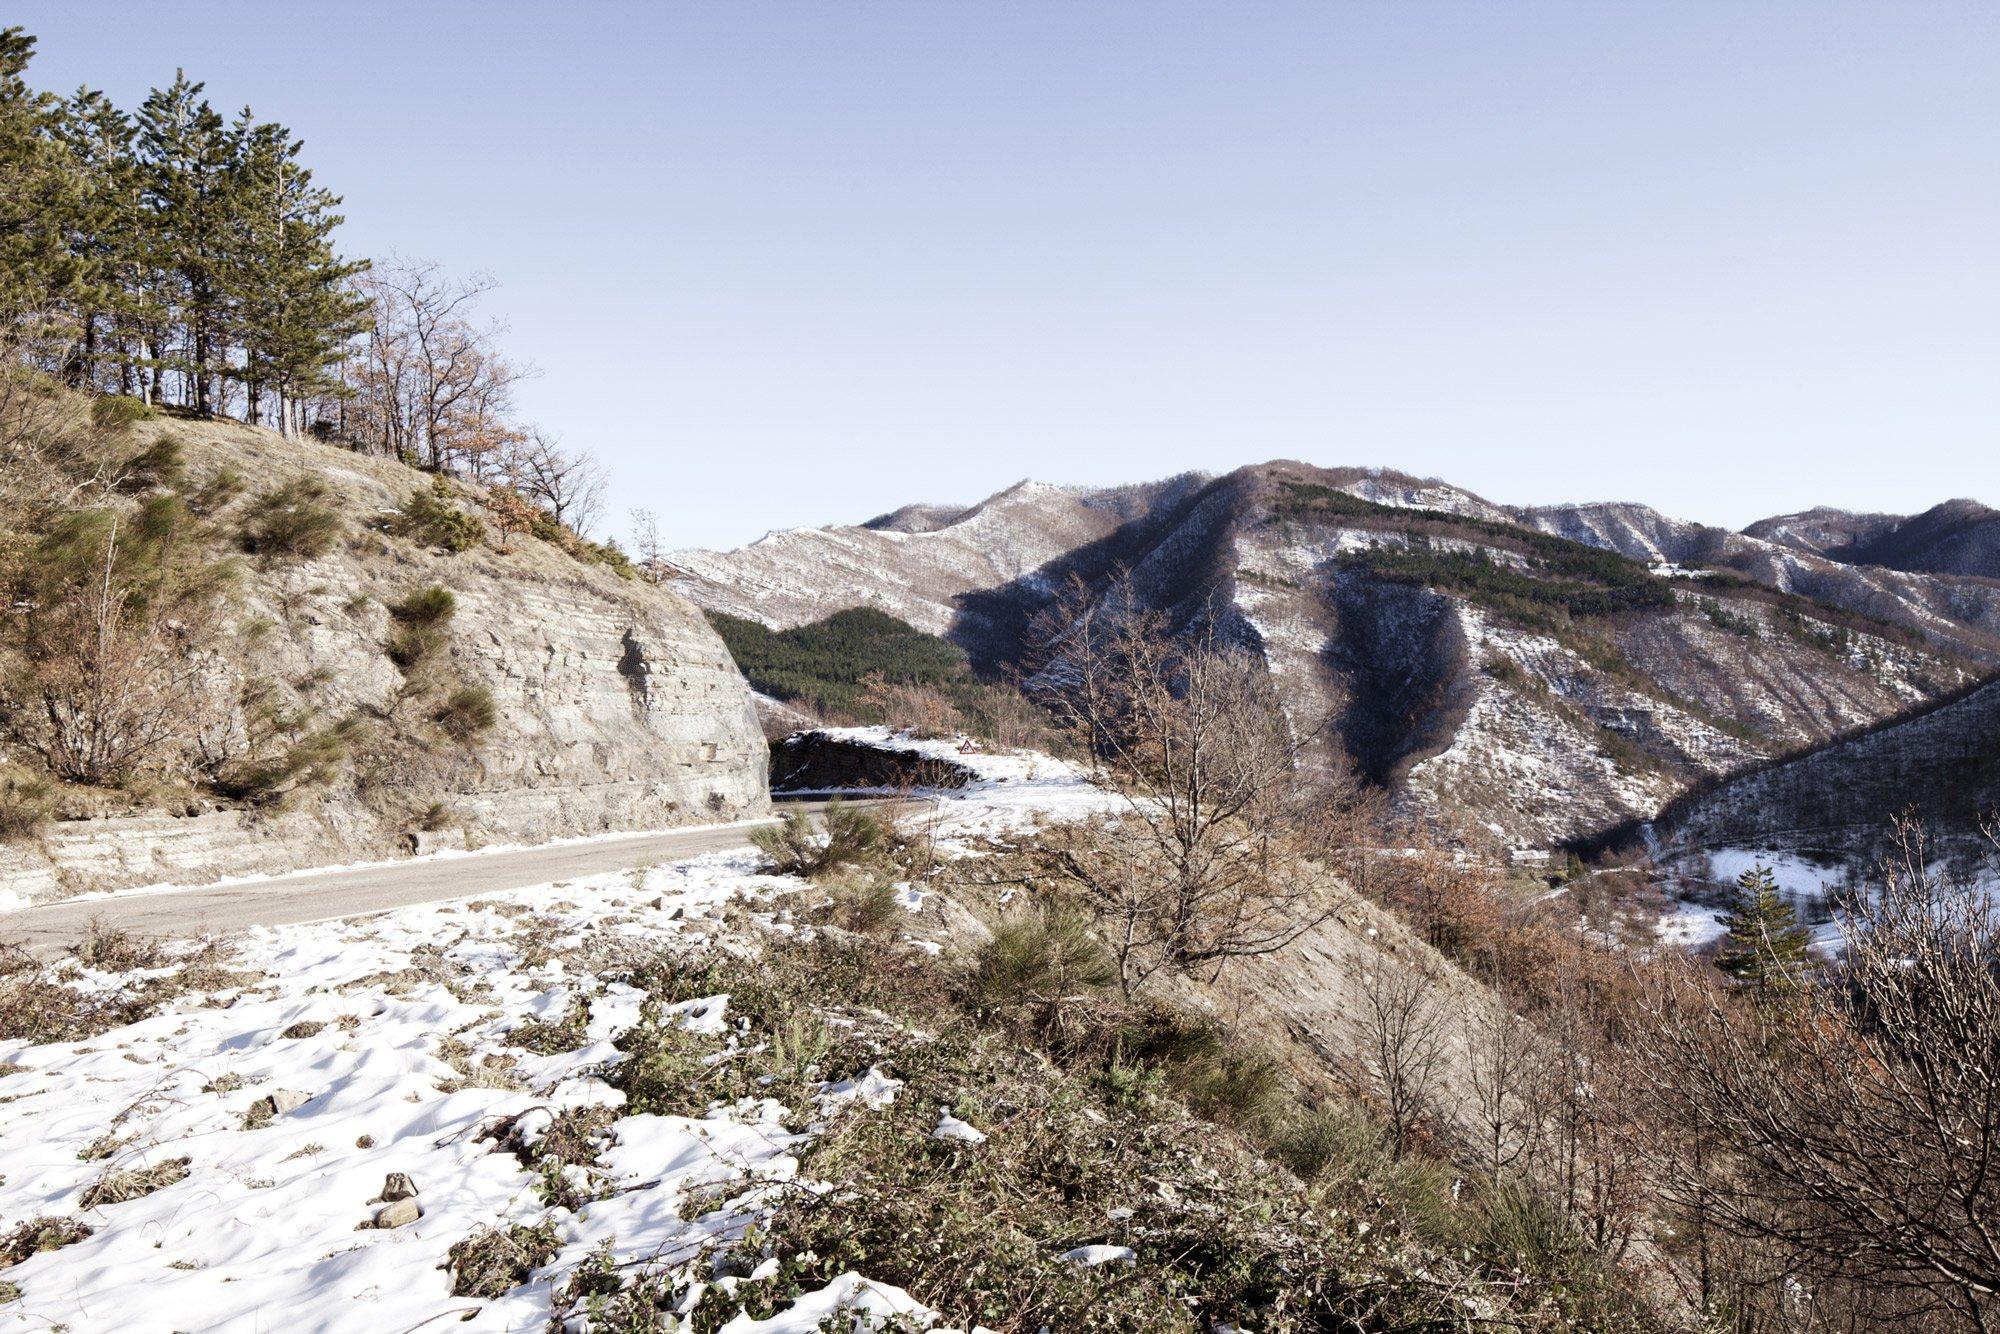 Appennino Tosco-Emiliano: strada tra Santa Sofia e Campigna © Urban Reports